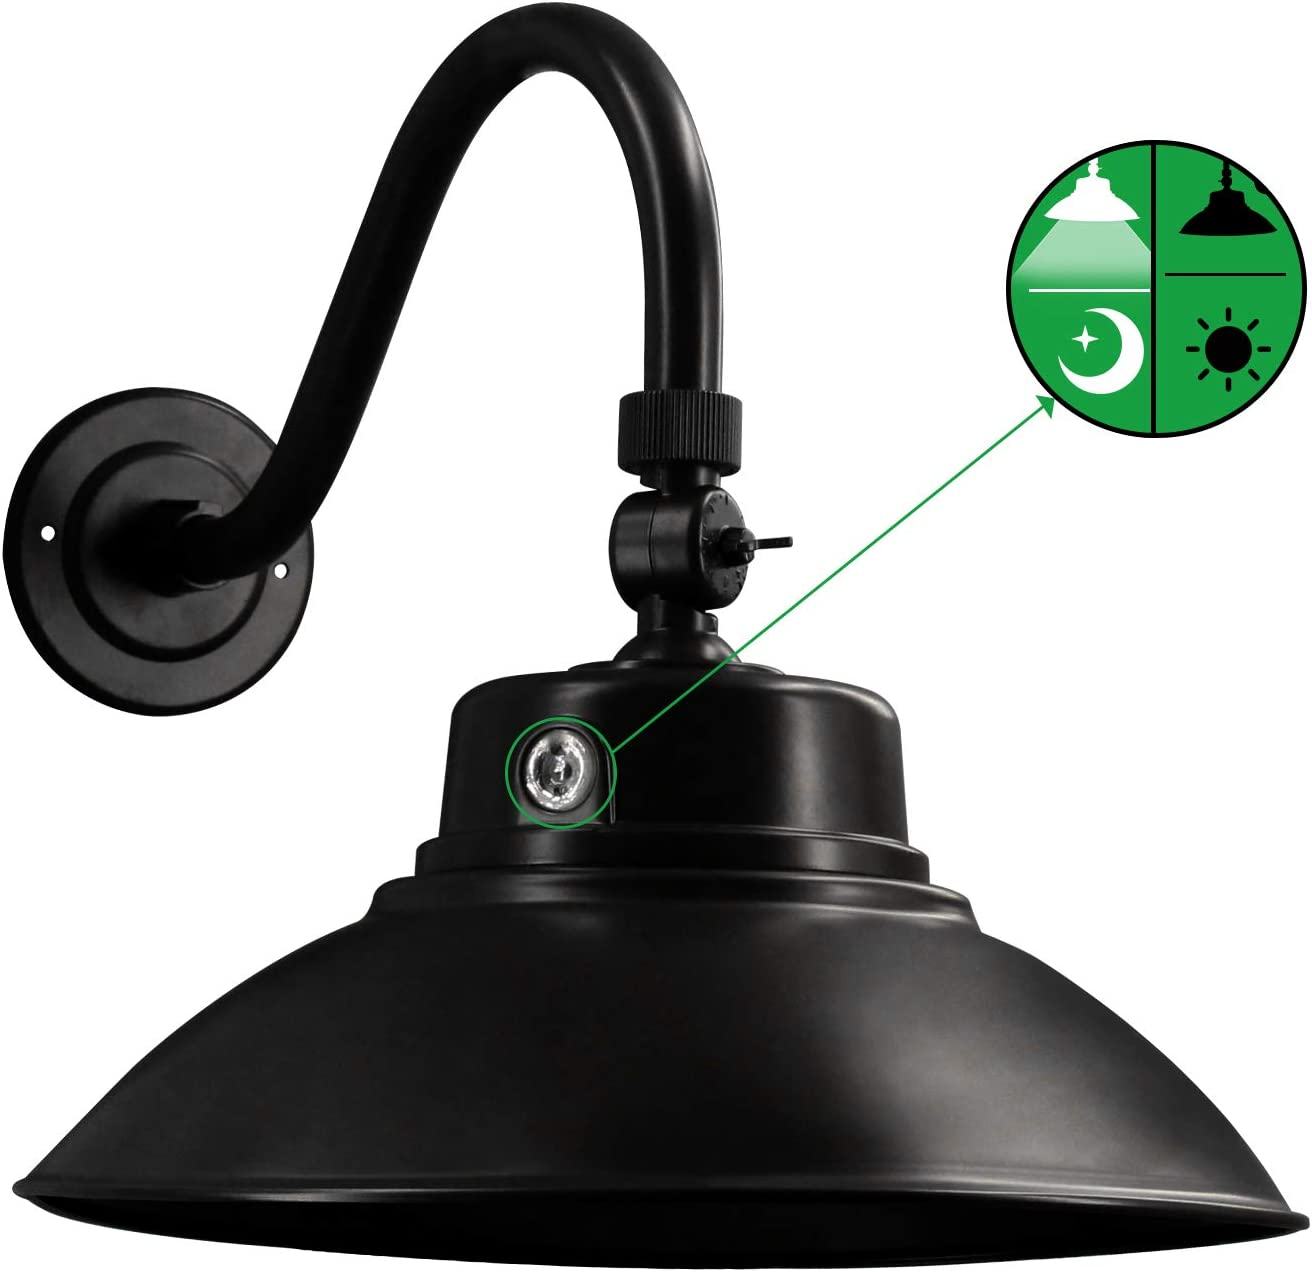 Black LED Gooseneck Barn Light 14 Inch Dusk to Dawn Sensor Classic Steel Shade 42W 4200lm 6000K Wall Porch Light with Photocell Outdoor Gooseneck Farmhouse Lighting Fixture